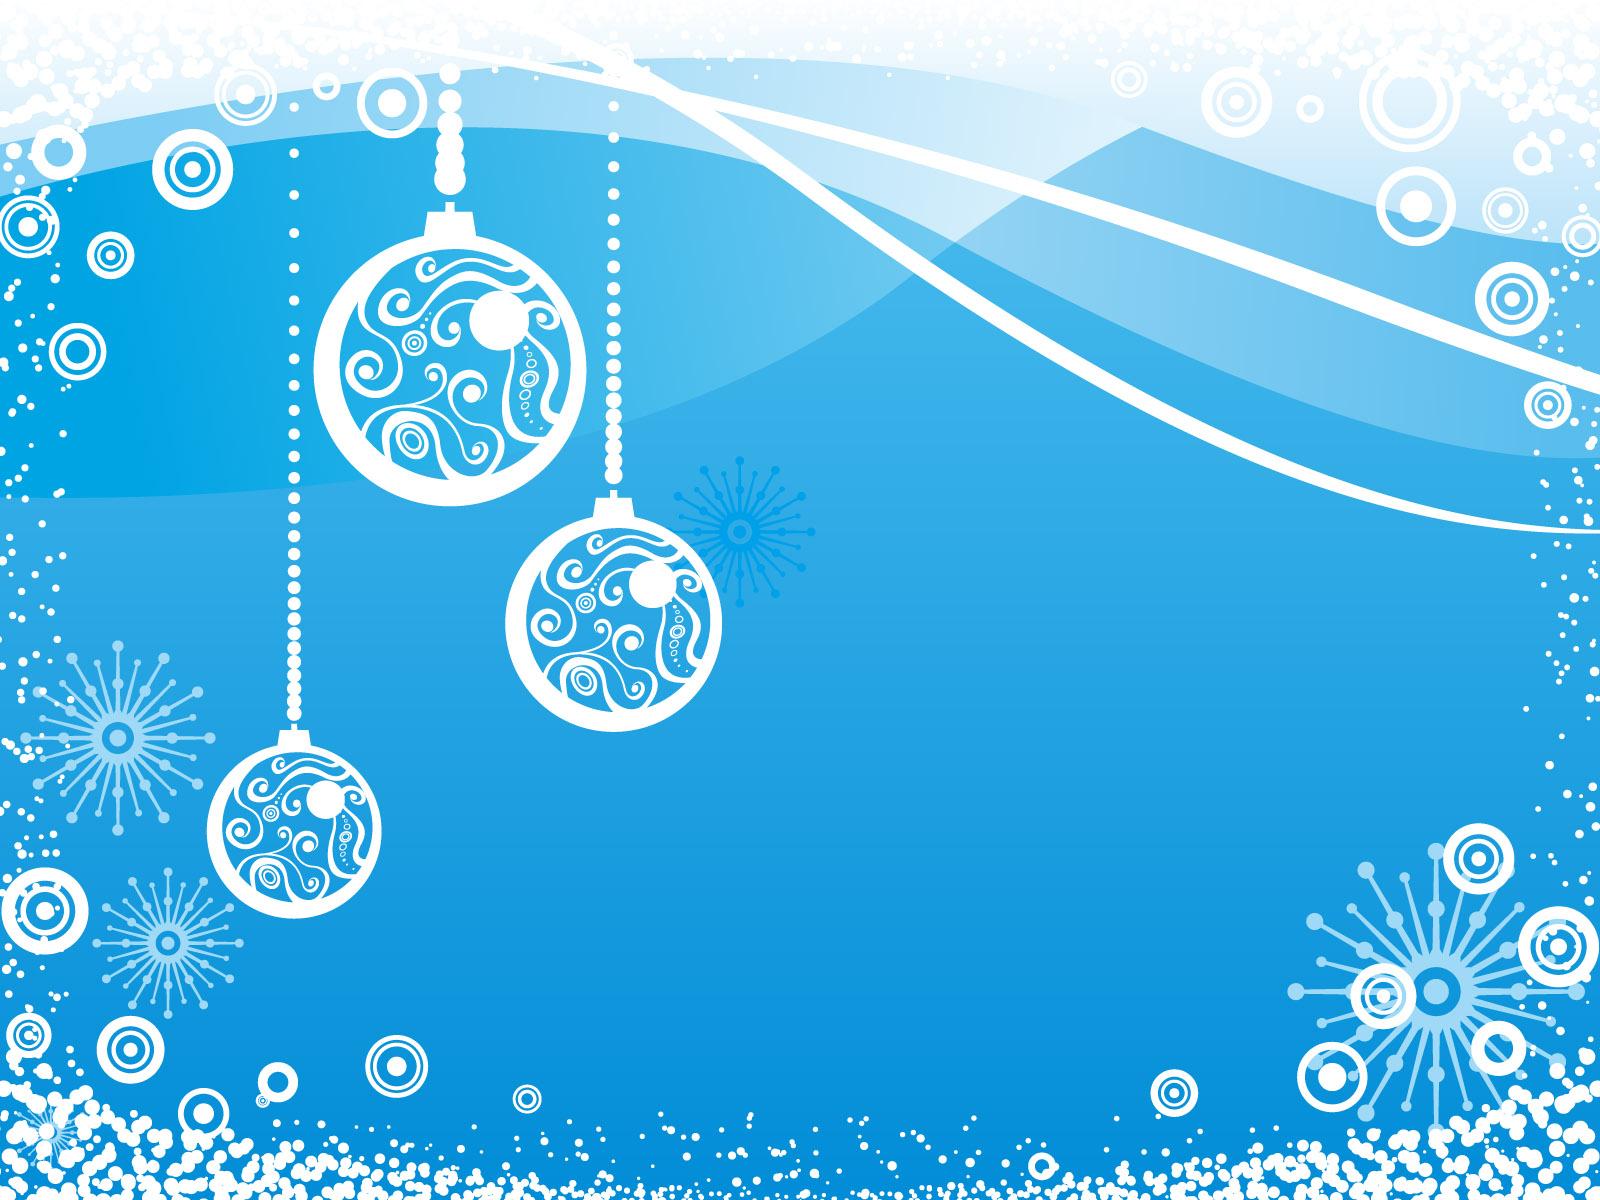 Season greetings blue hd wallpaper home of wallpapers free white drawn globes hanging 1080p image 2012 free download wallpapers resolution 1600px x 1200px httpthewallpaperdbspot m4hsunfo